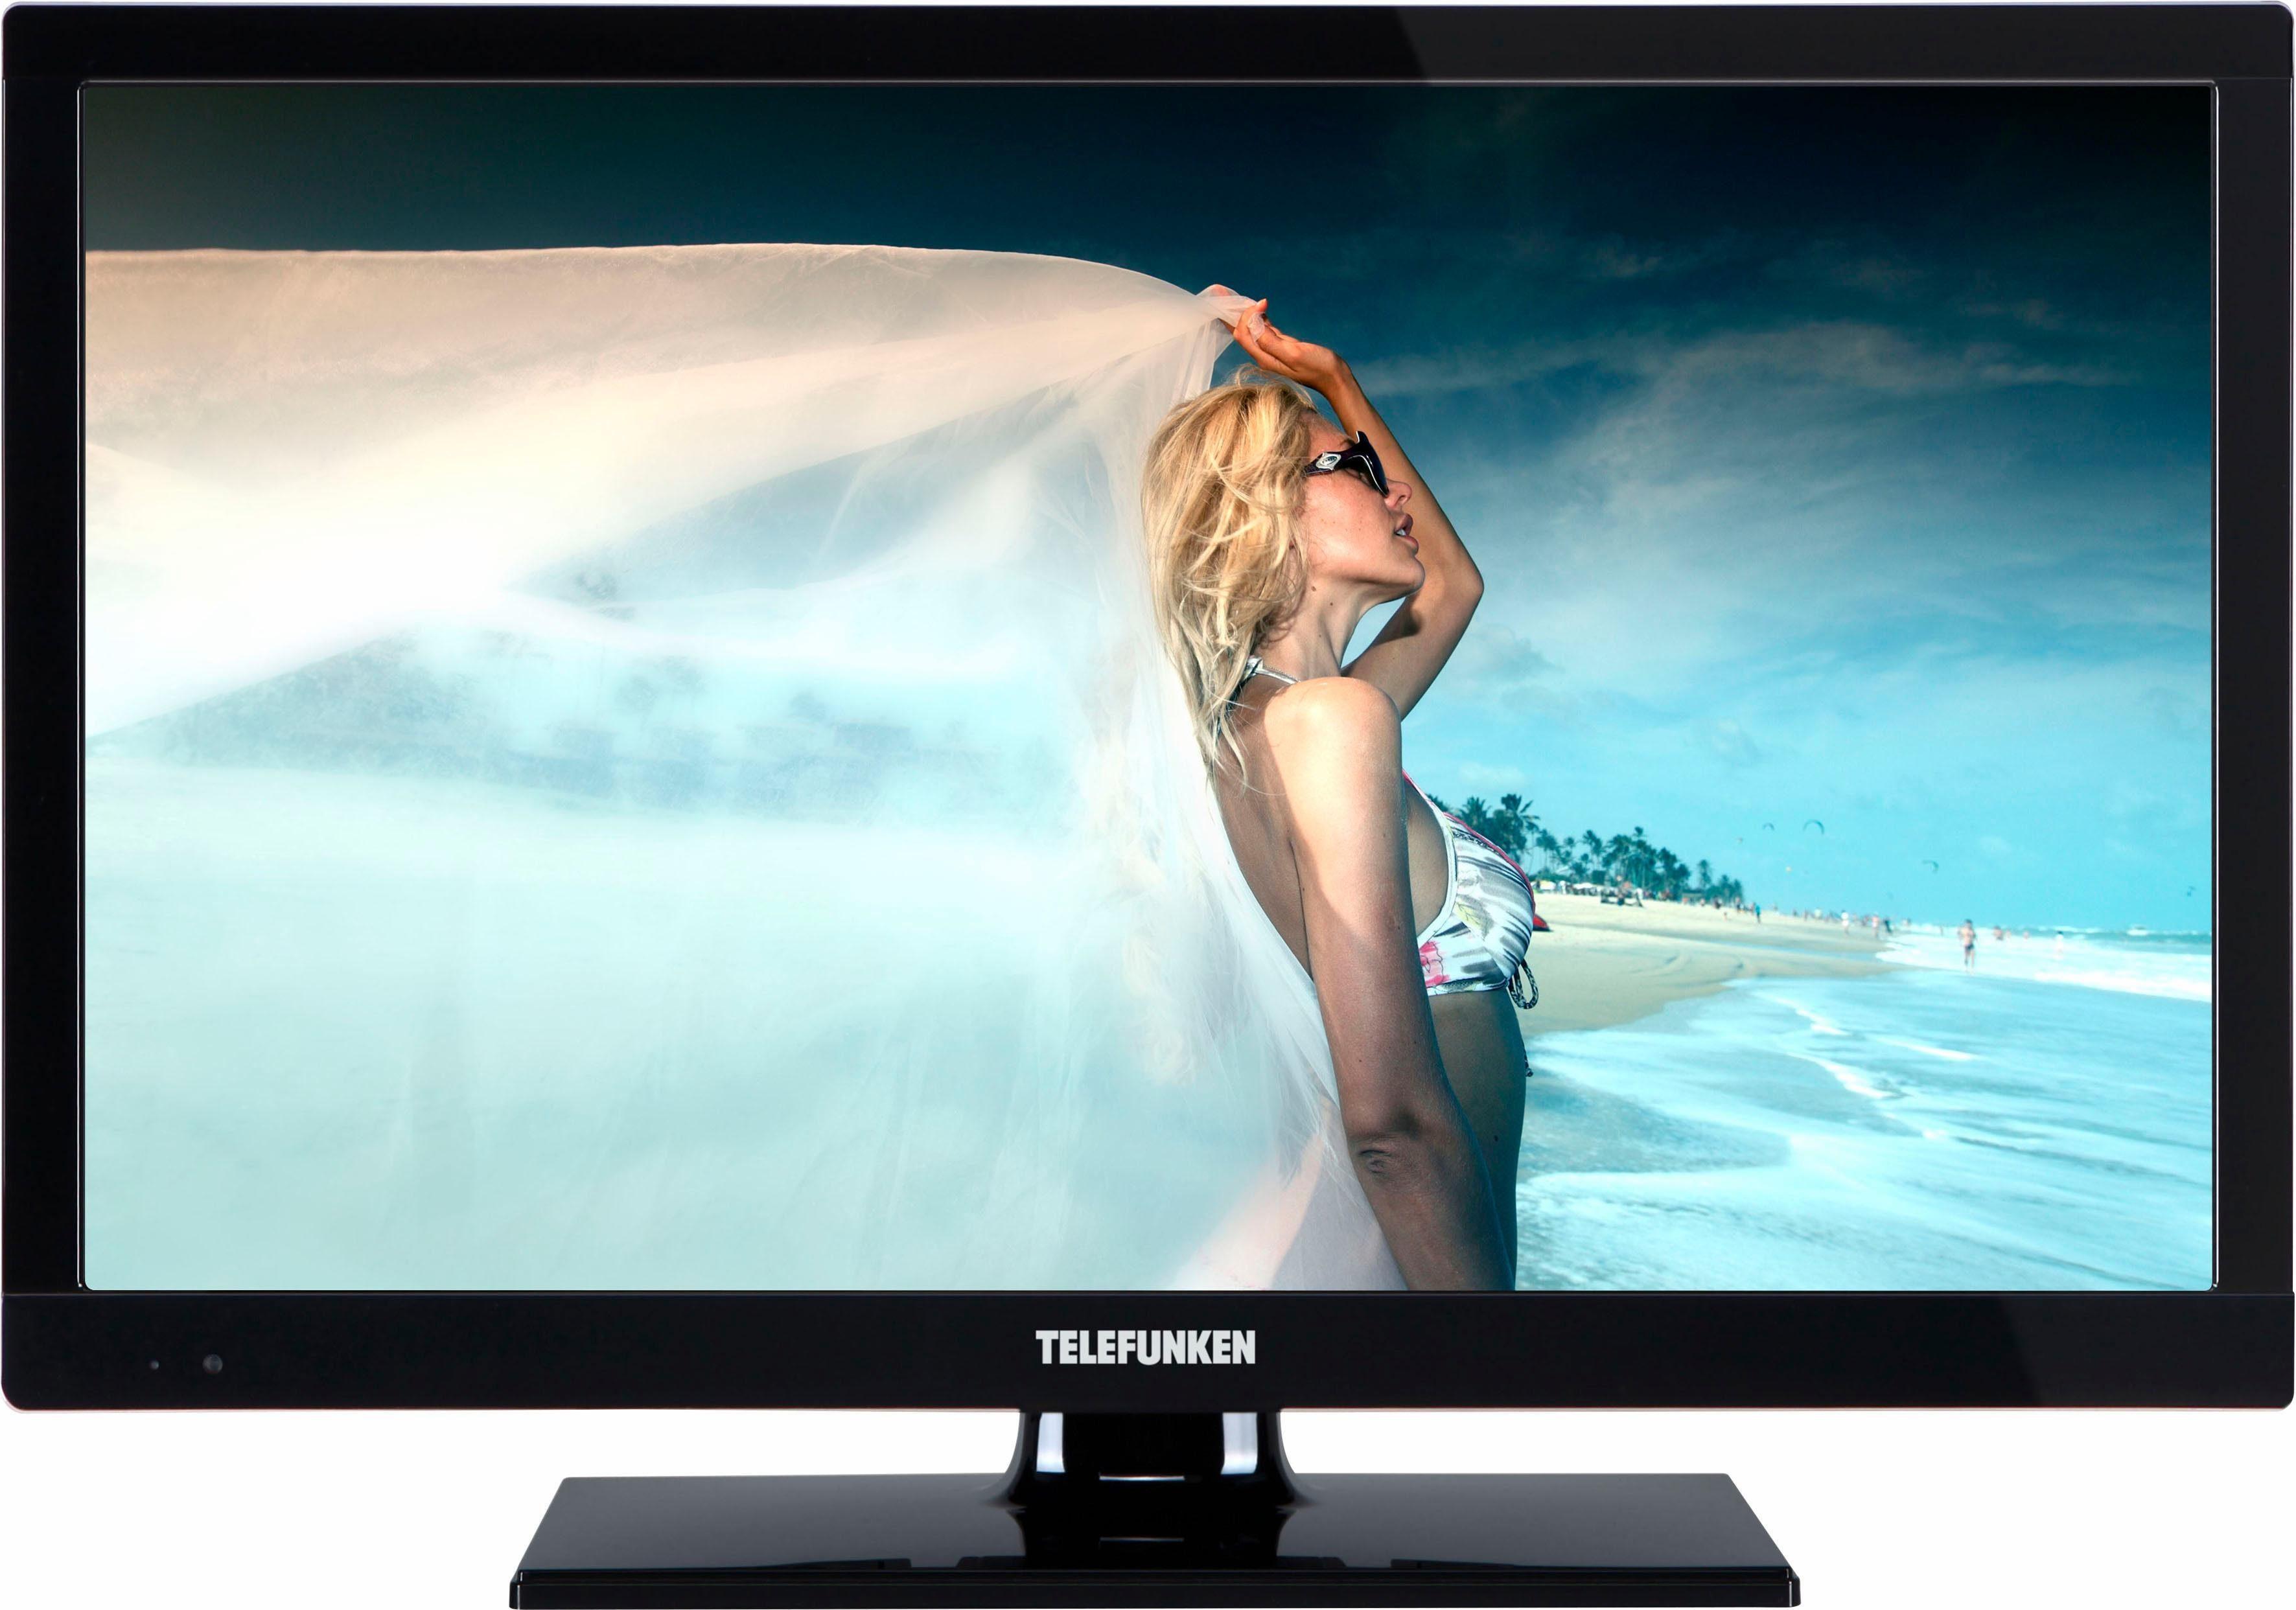 Telefunken L28H272M4, LED Fernseher, 72 cm (28 Zoll)